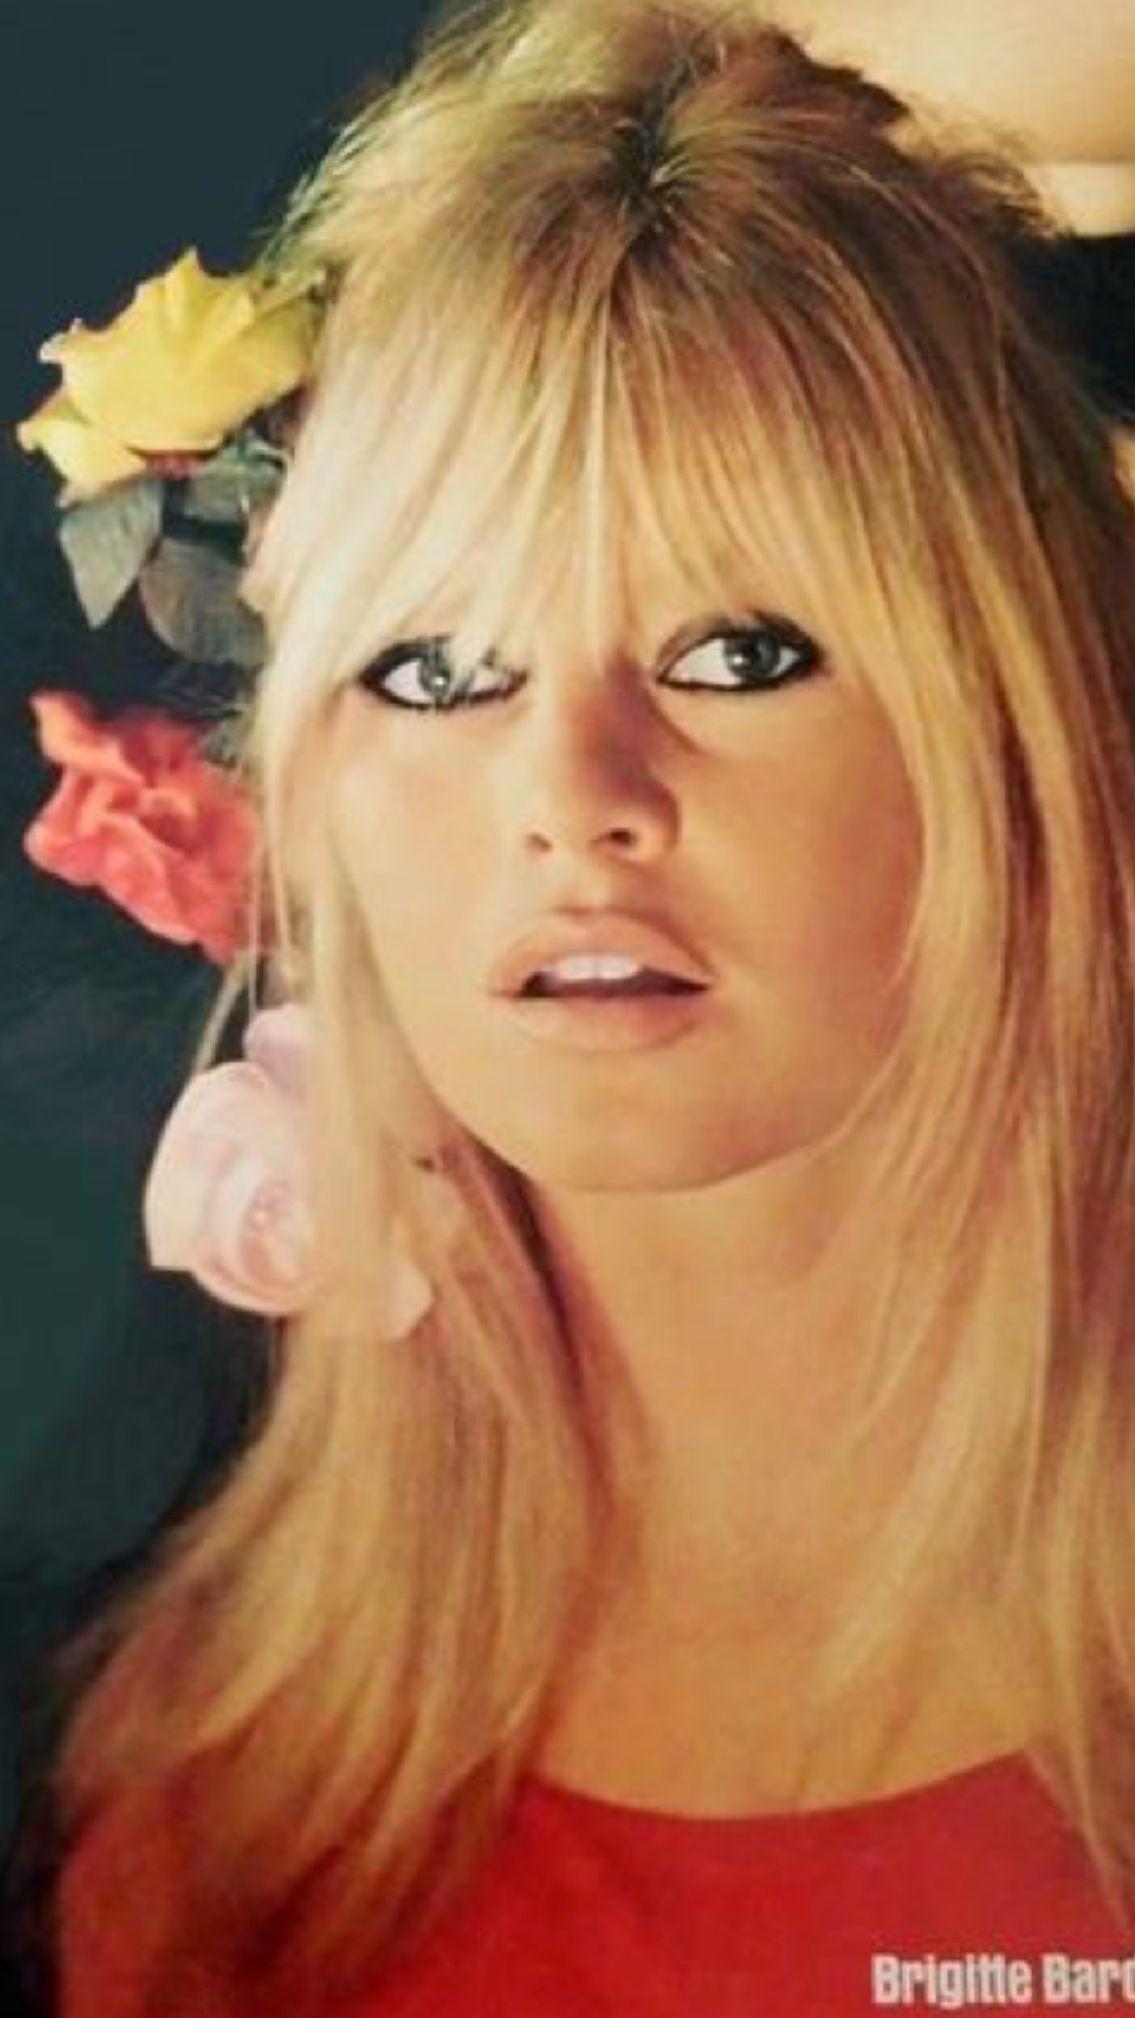 Pin By Kim Scholer On Brigitte Bardot Brigitte Bardot Bridgitte Bardot Bridget Bardot